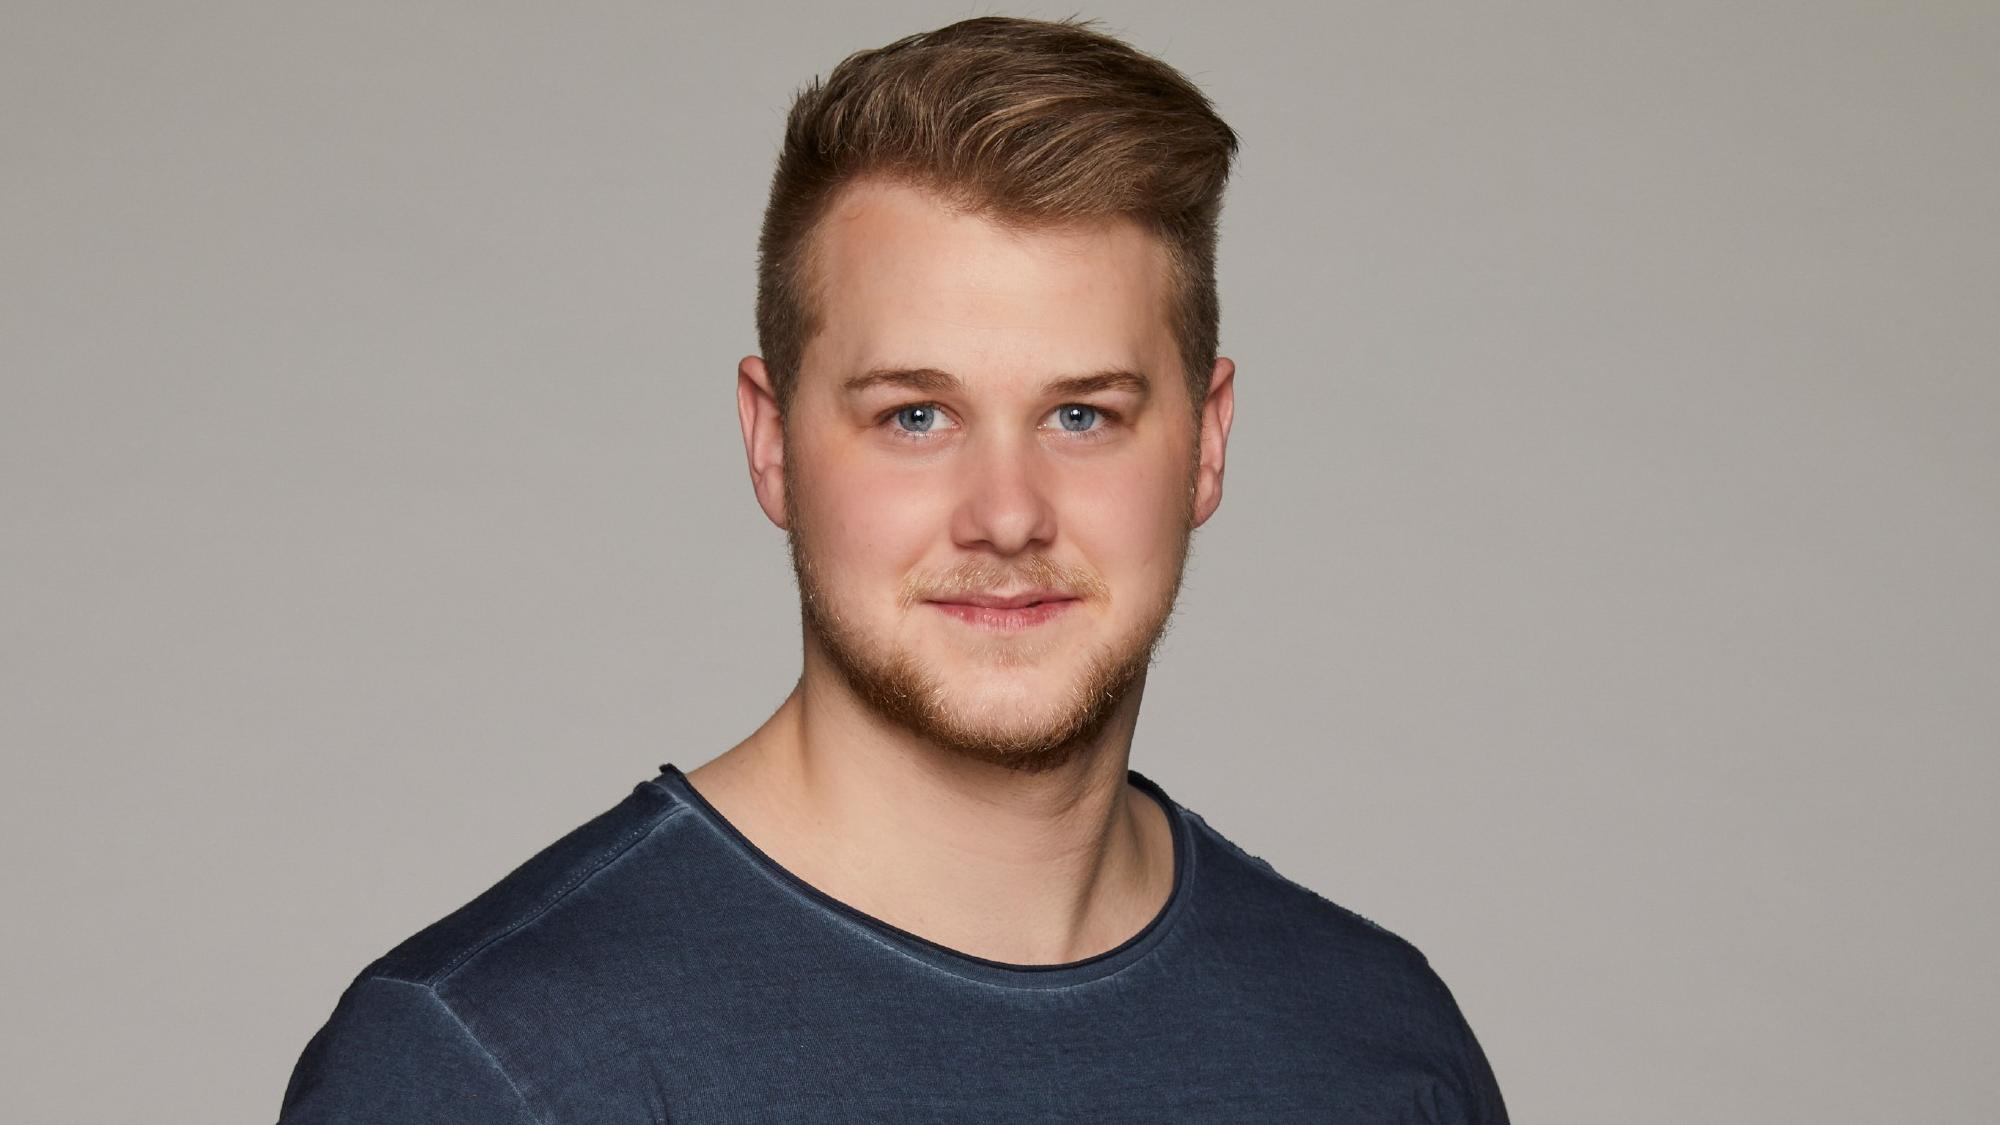 GZSZ-Star Felix van Deventer verrät, wie er zum Muskelprotz geworden ist